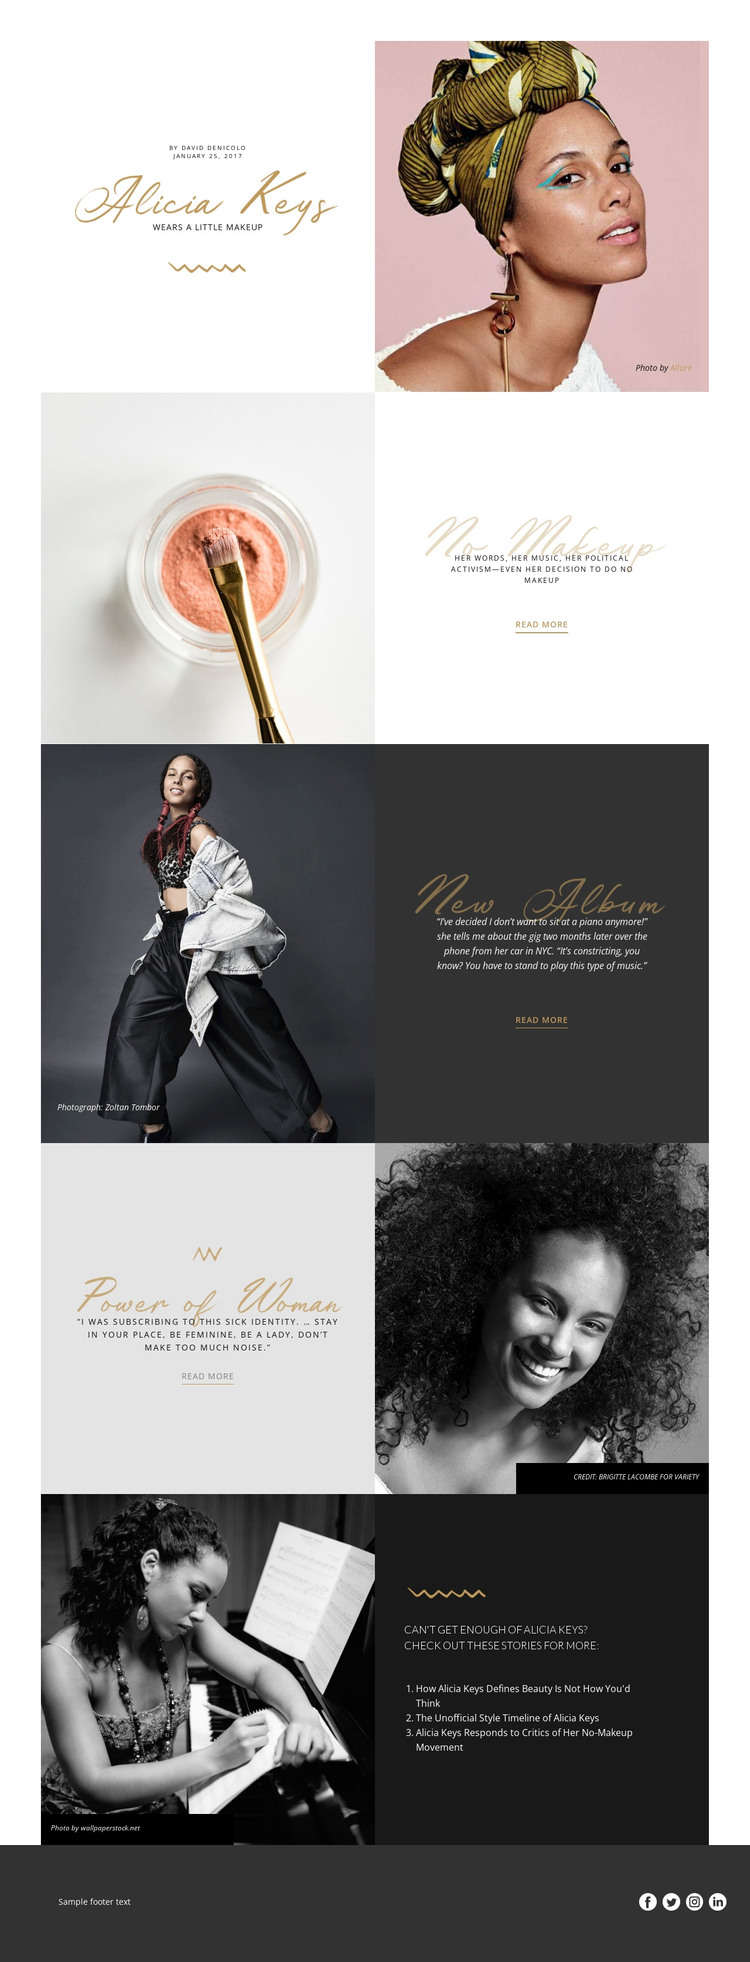 Alicia Keys HTML Template